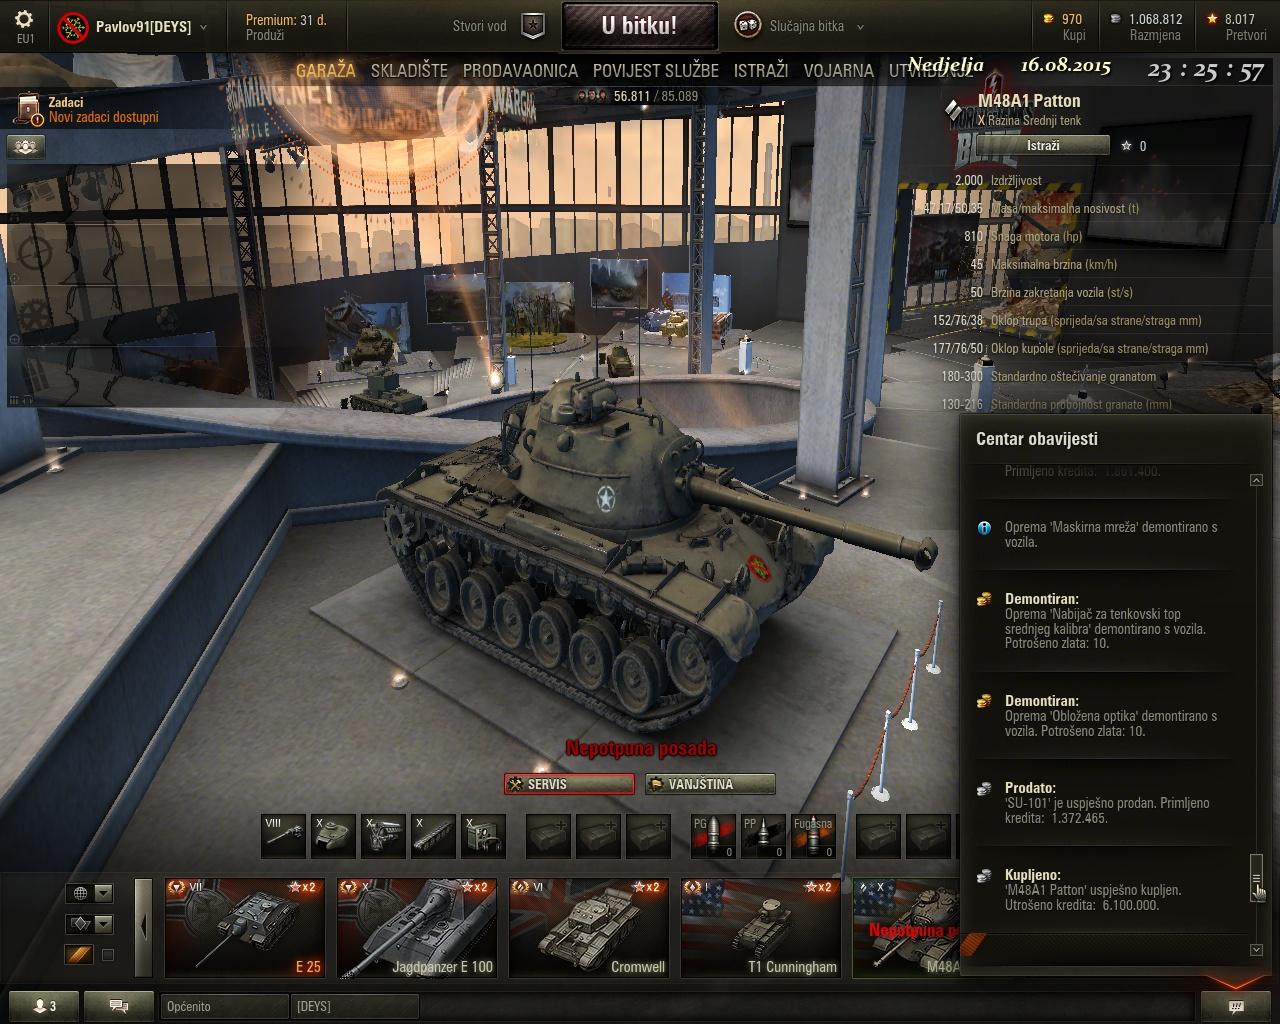 Pavlov91 - M48 Patton - The general Shot_290